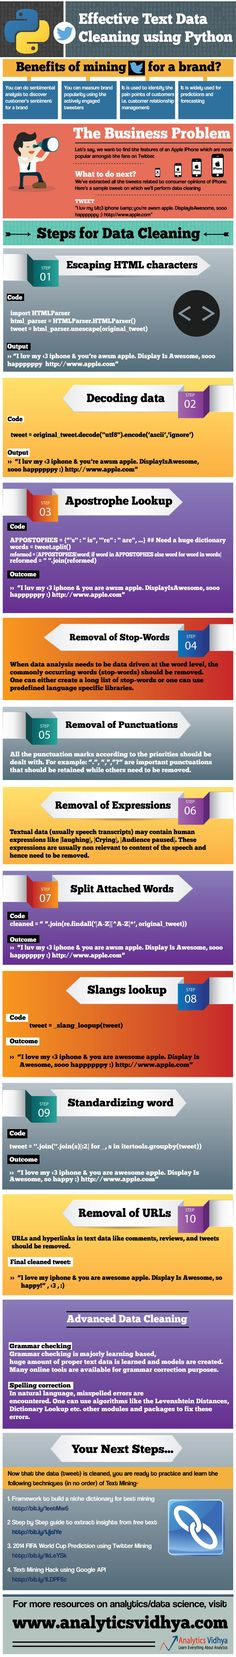 http://social-media-strategy-template.blogspot.com/ text mining using python, data science infographics